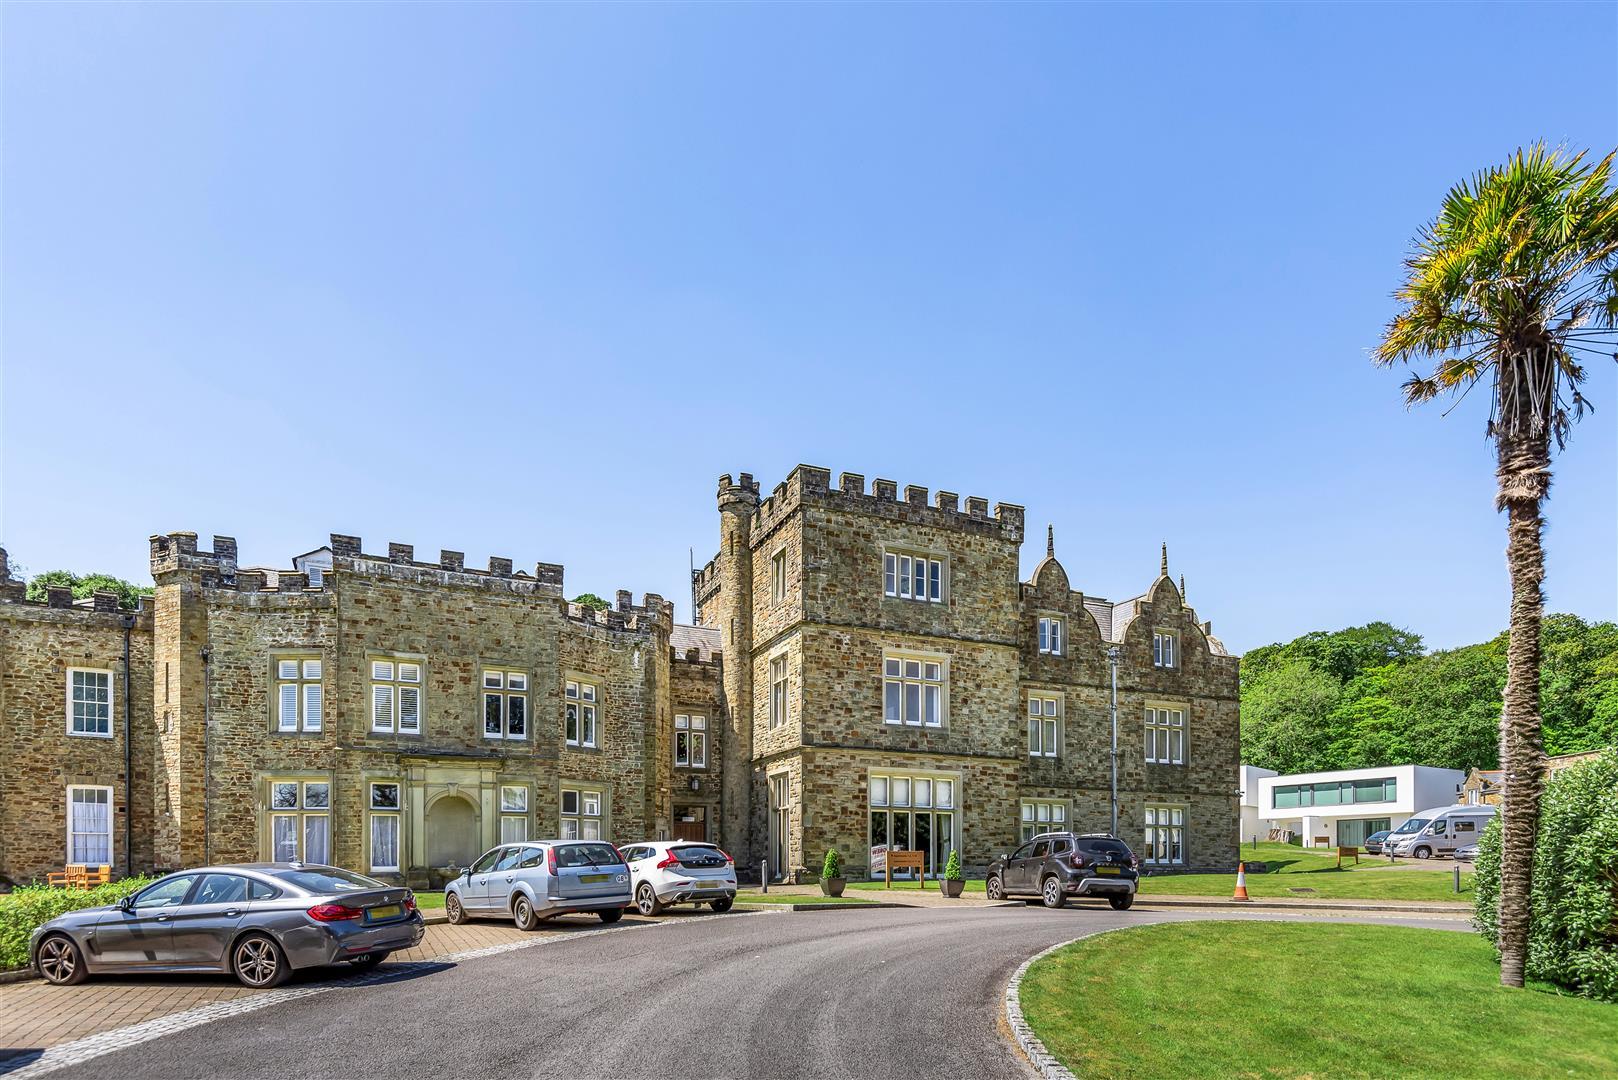 Clyne Castle, Mill Lane, Blackpill, Swansea, SA3 5BW